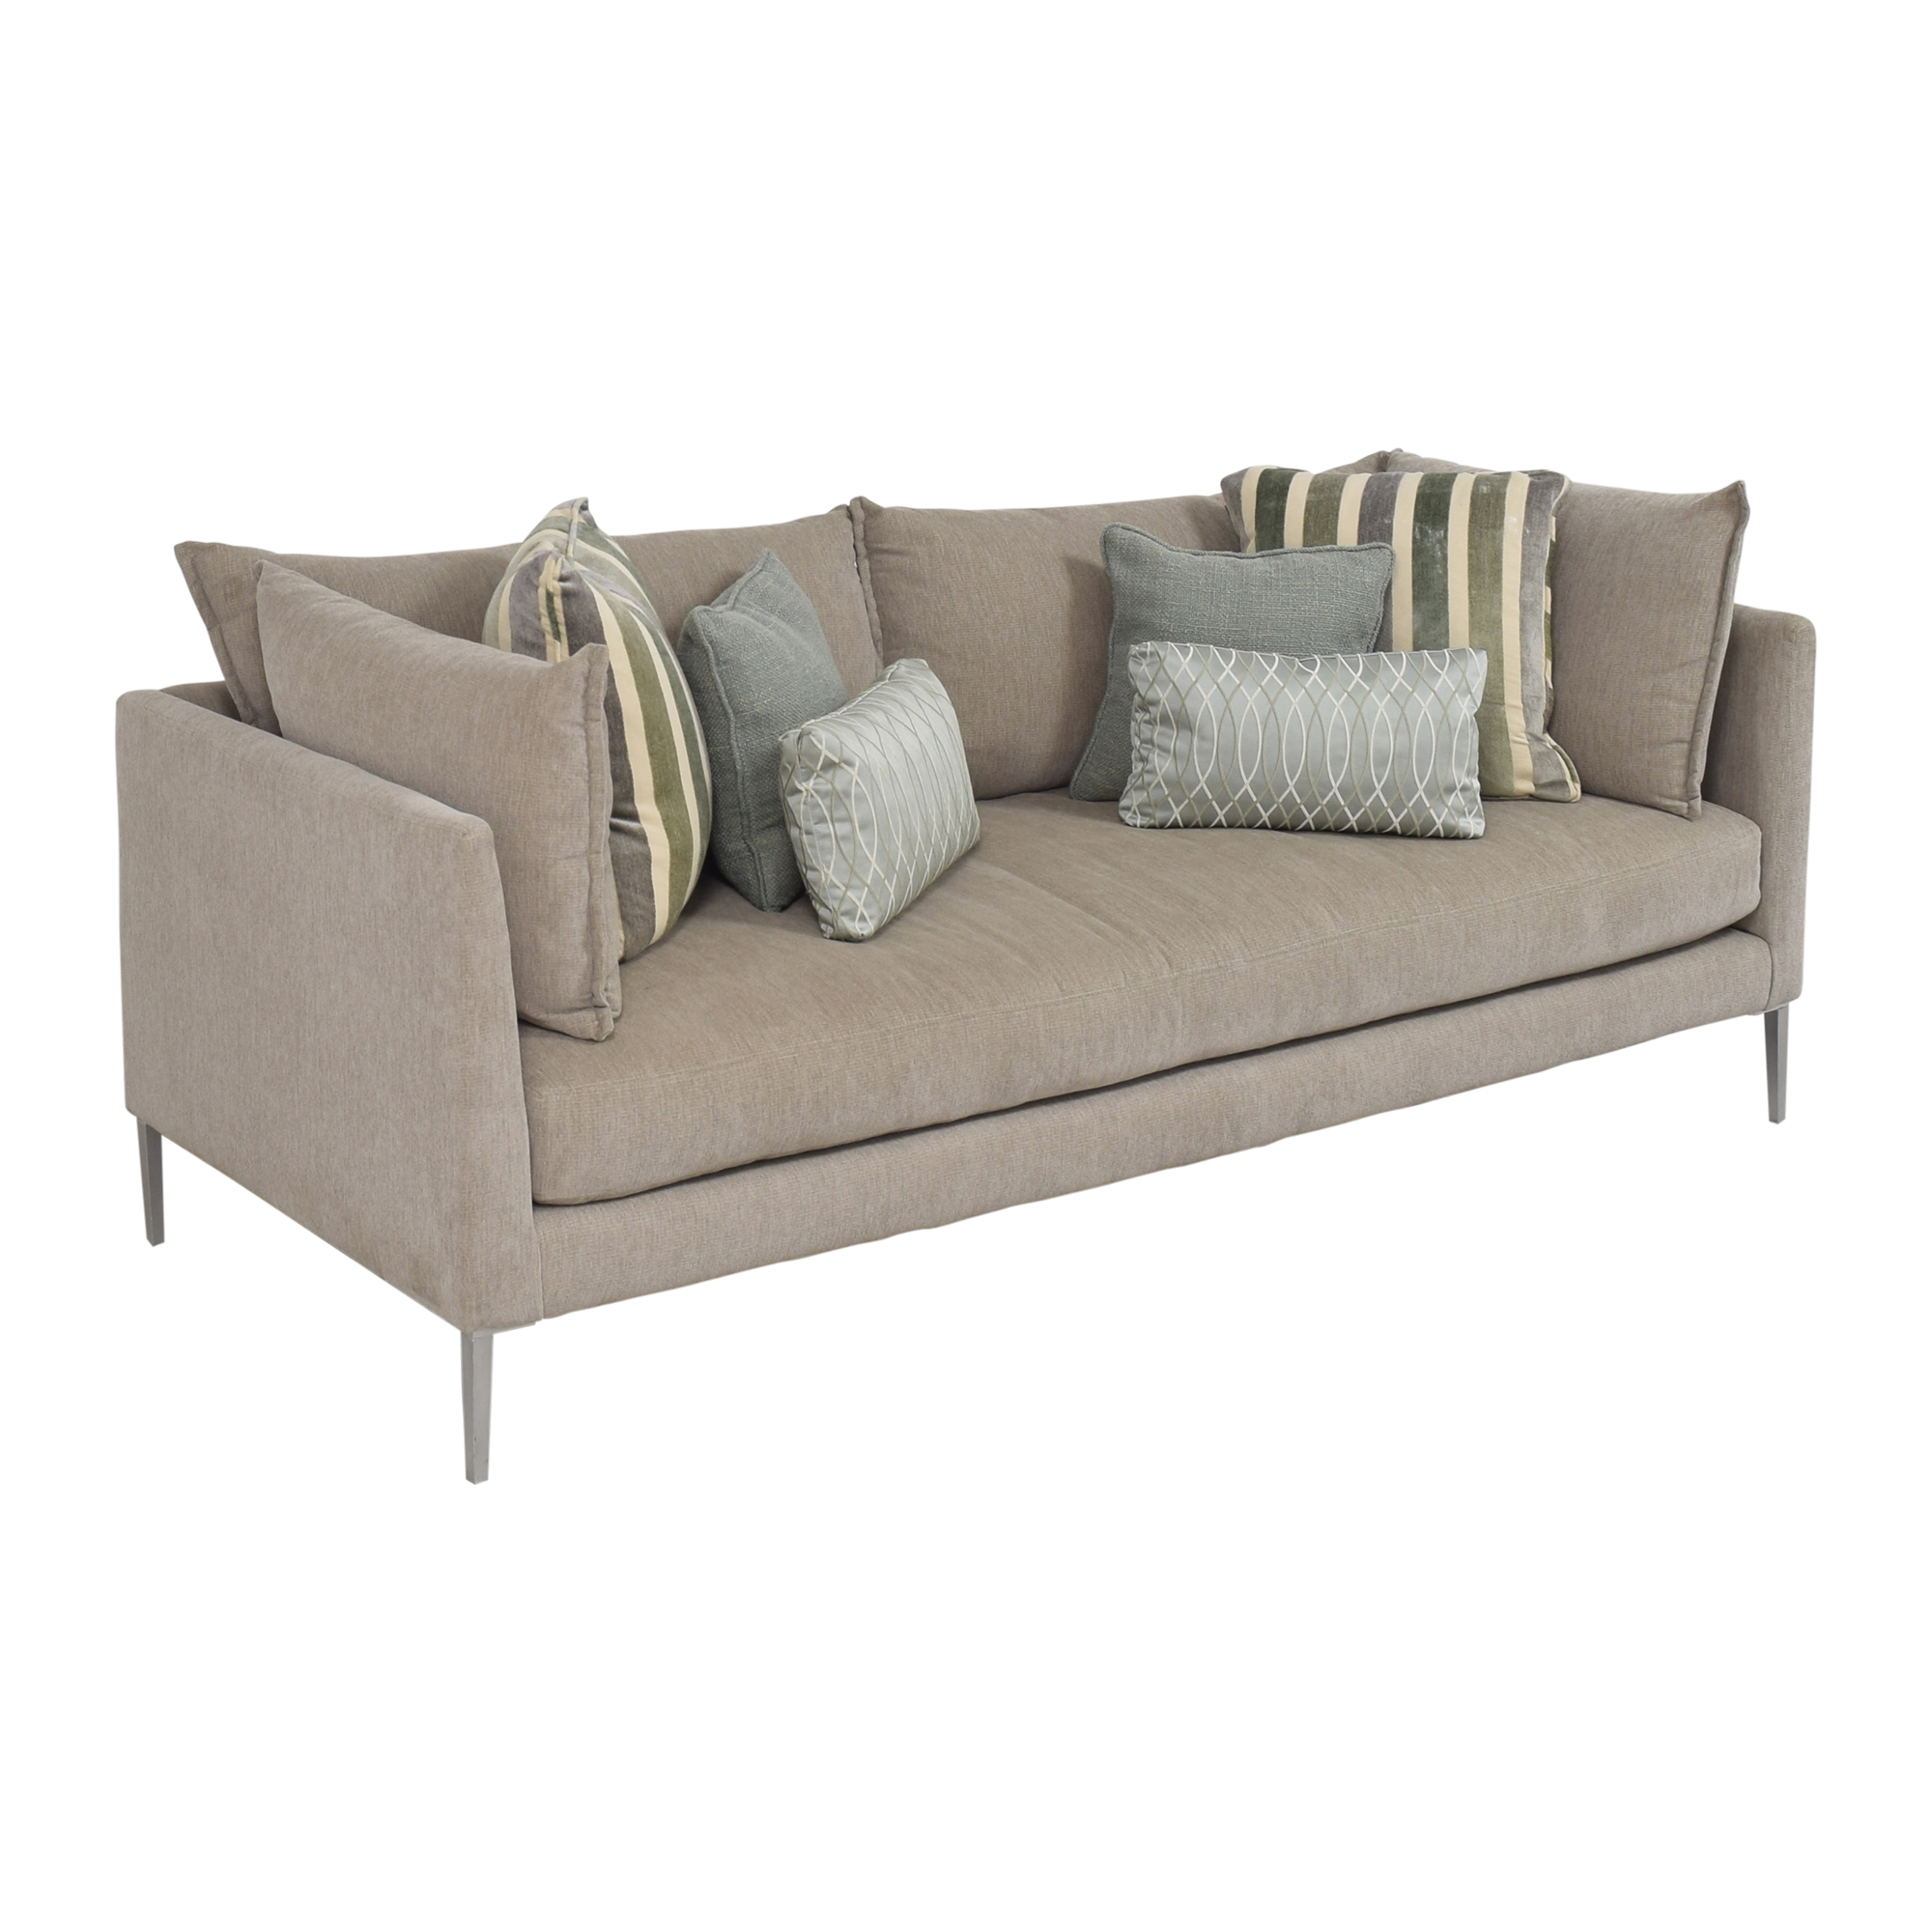 Room & Board Vela Sofa sale